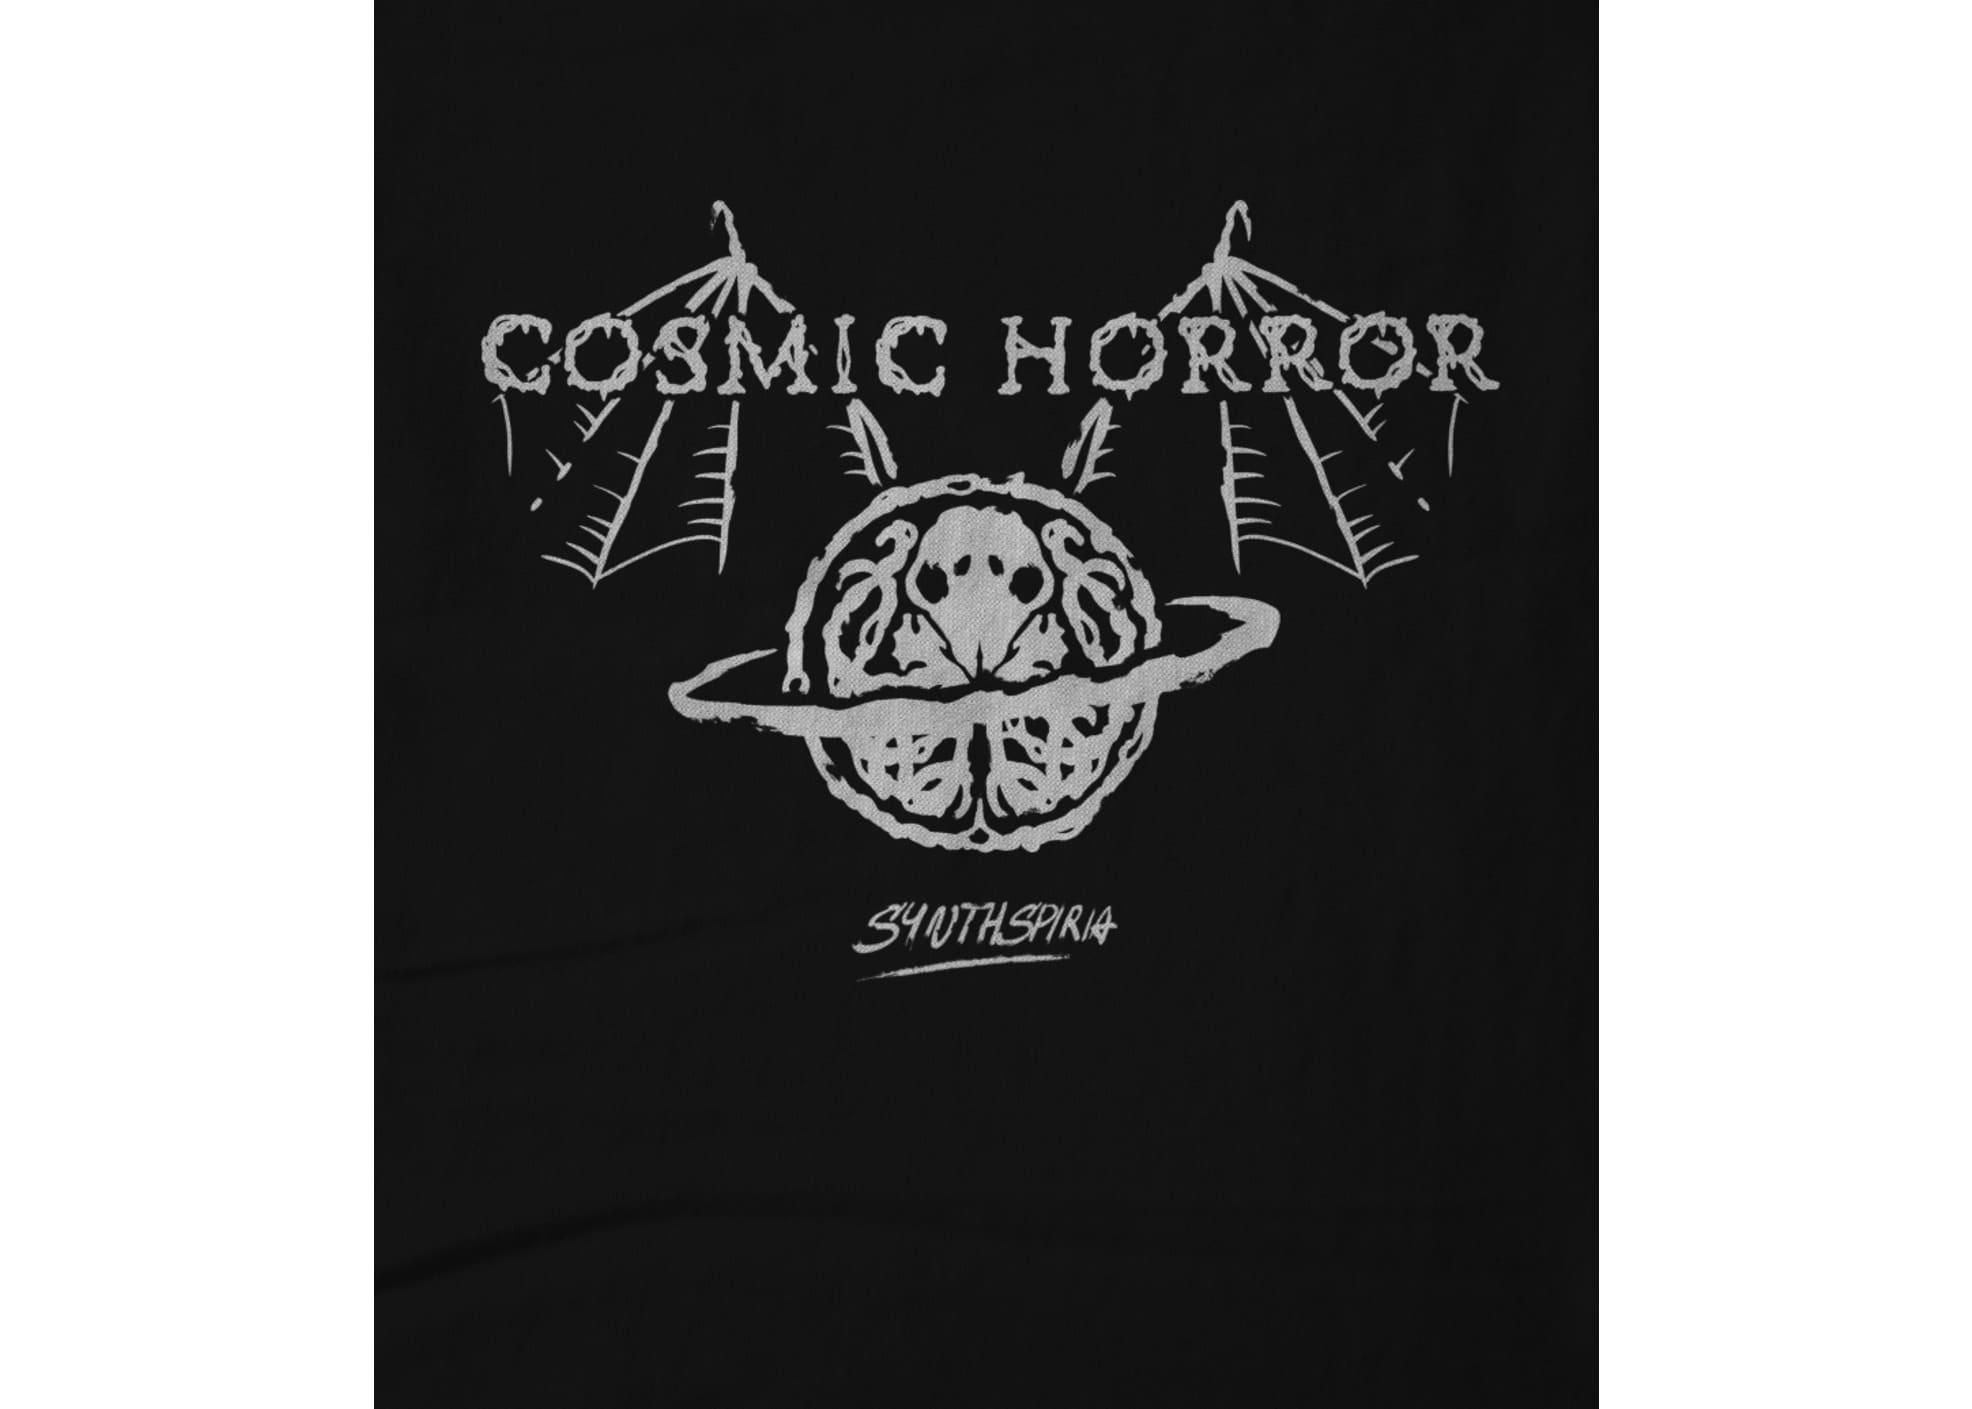 Synthspiria cosmic horror   white 1591017688